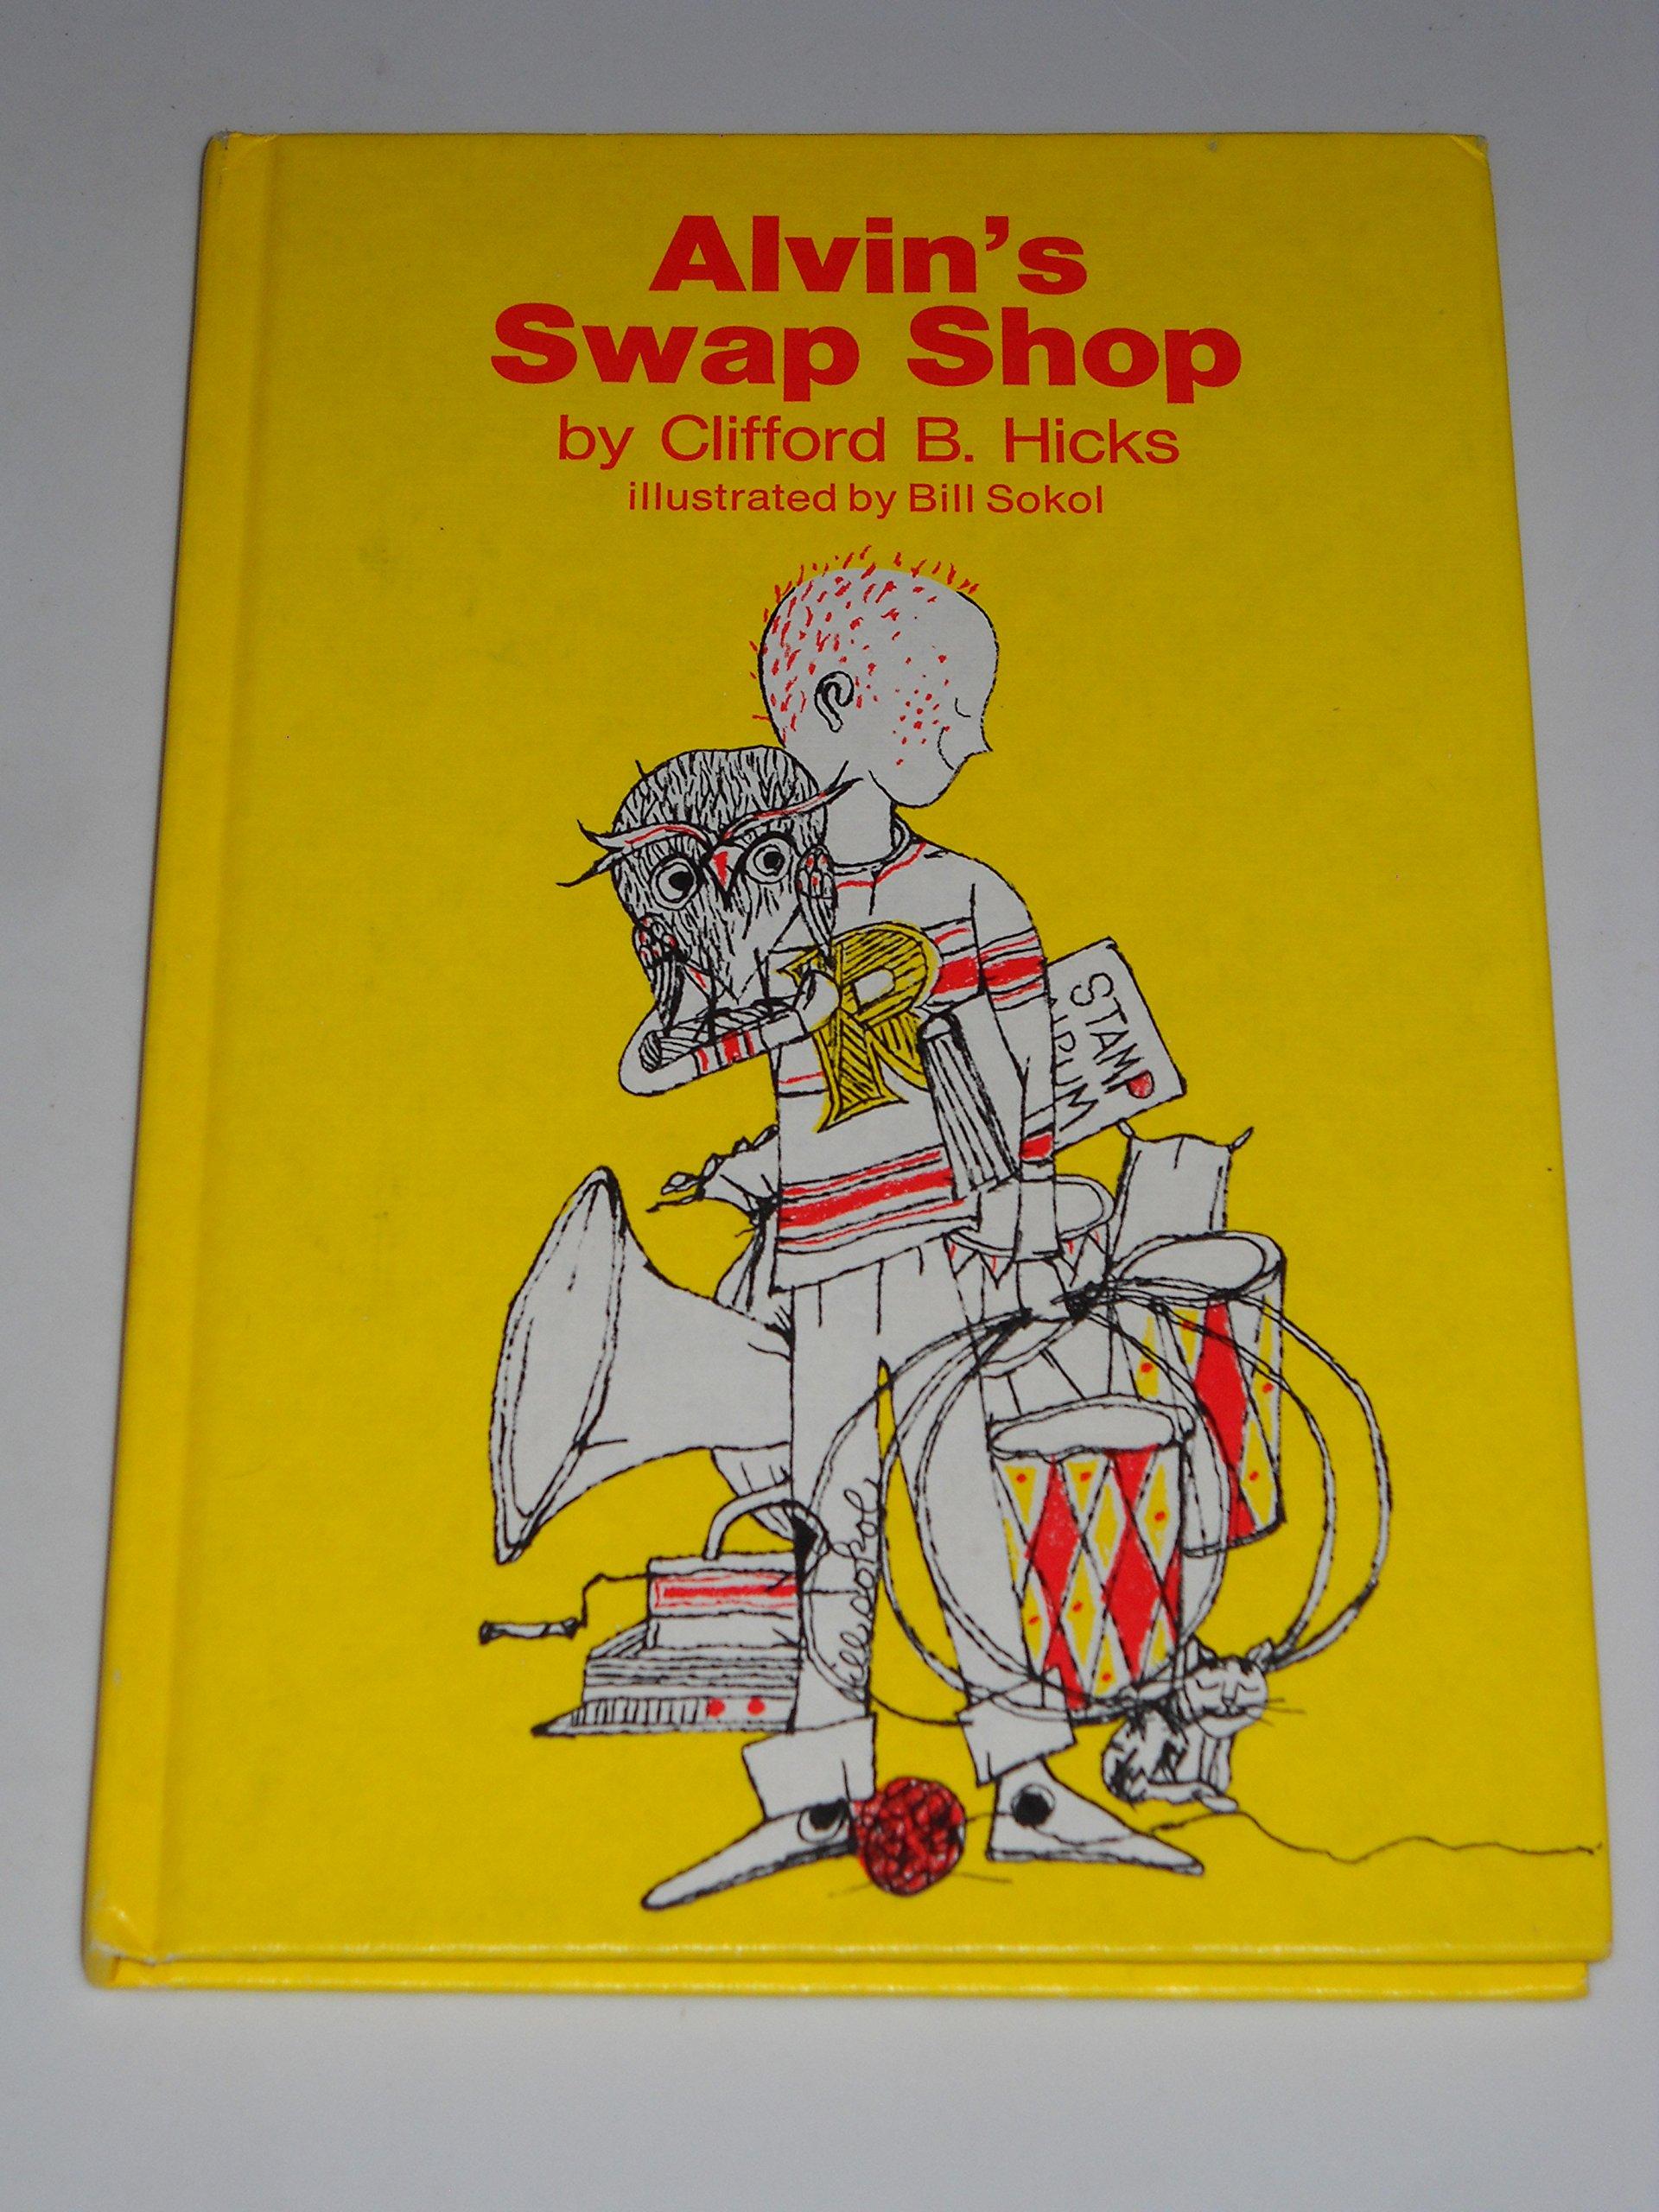 083105931dcb Alvin's Swap Shop: Clifford B. Hicks, Bill Sokol: 9780030898051 ...